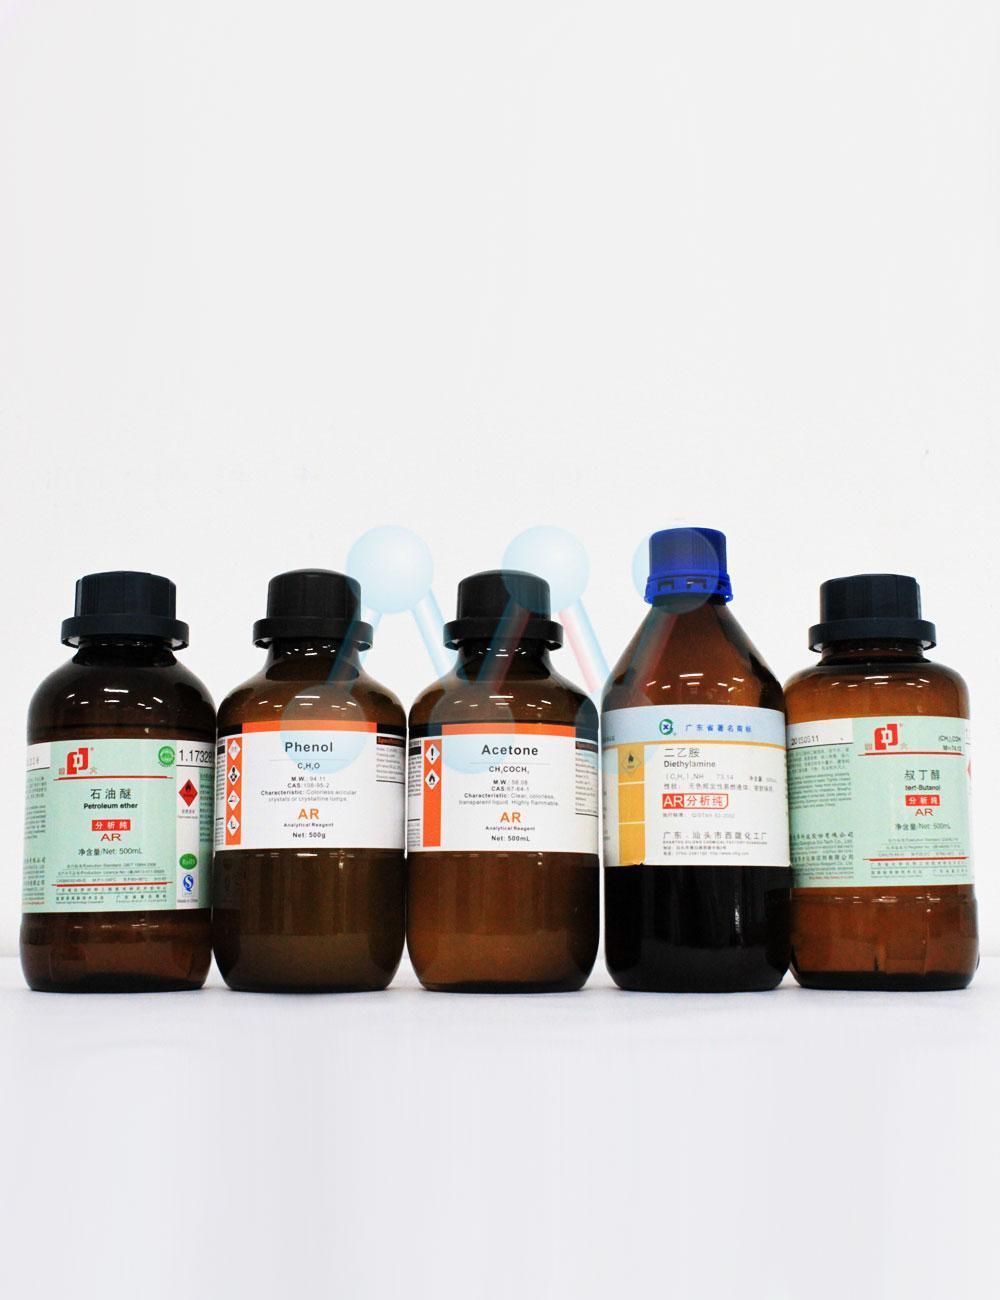 1,1,2,2-Tetrachloroethane C2H2Cl4